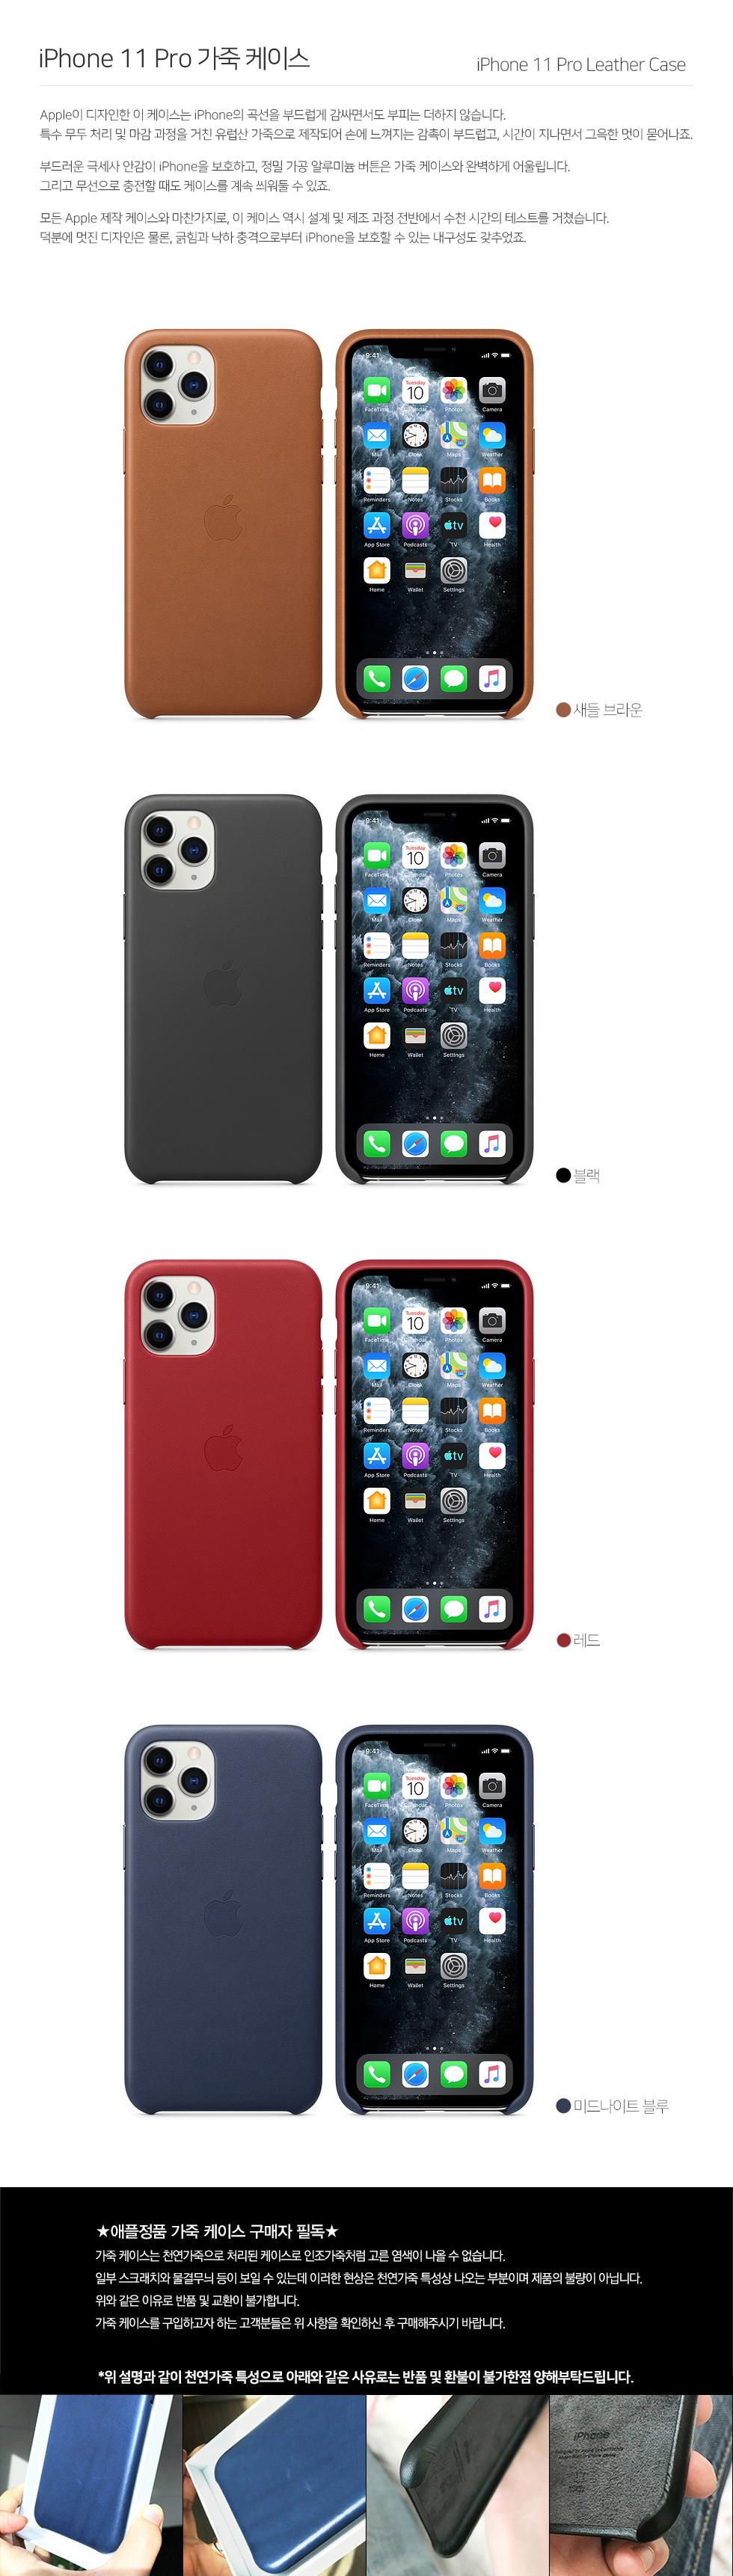 [Apple] 애플 아이폰11프로 가죽 케이스 55,000원-(주)케이티씨에스디지털, 애플, 케이스, 아이폰 11 Pro MAX바보사랑 [Apple] 애플 아이폰11프로 가죽 케이스 55,000원-(주)케이티씨에스디지털, 애플, 케이스, 아이폰 11 Pro MAX바보사랑